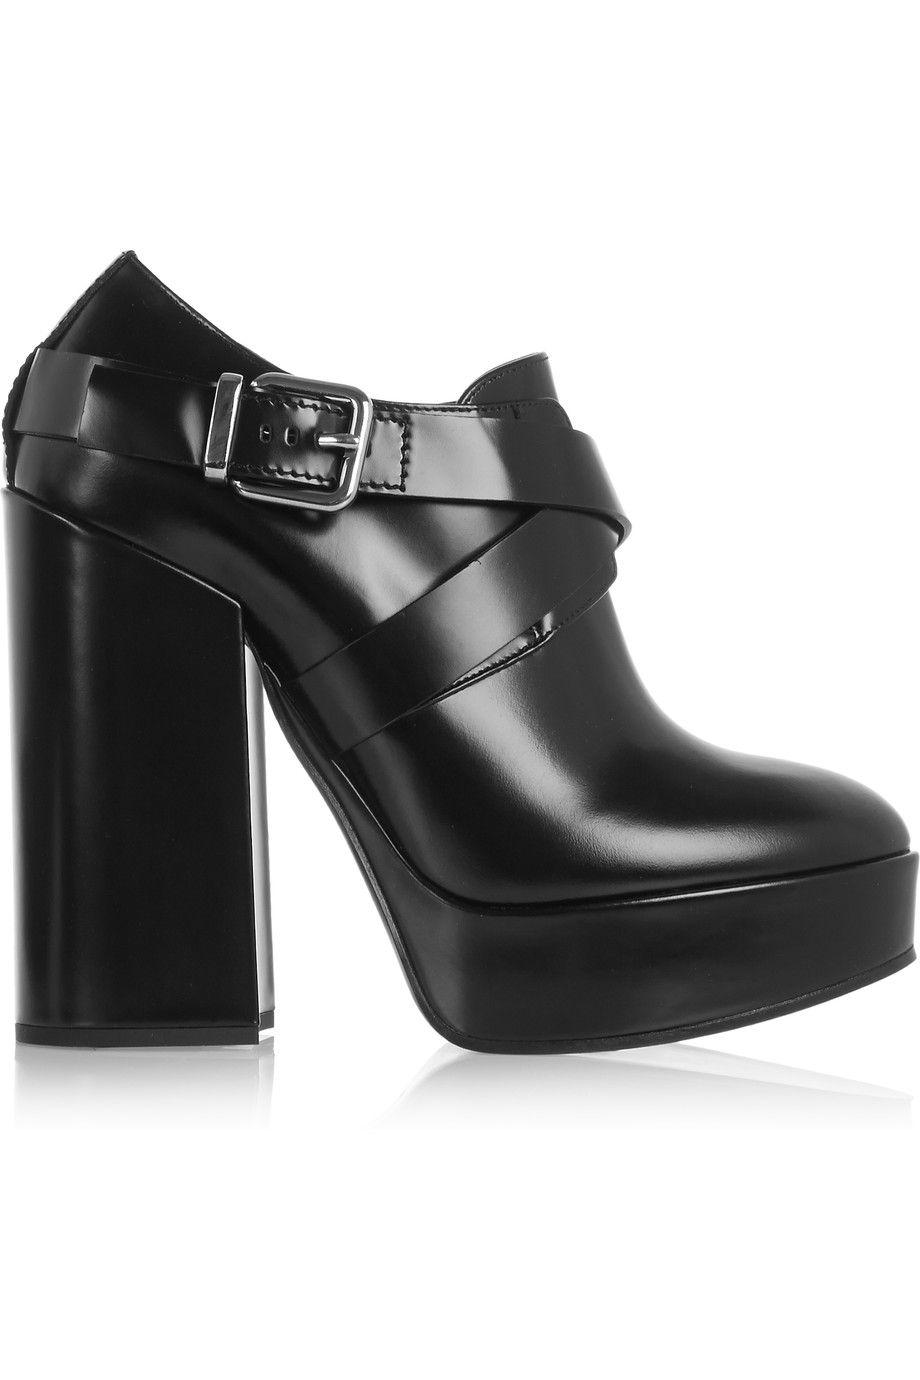 1e73f09ccd8 JIL SANDER Leather Platform Ankle Boots.  jilsander  shoes  boots ...